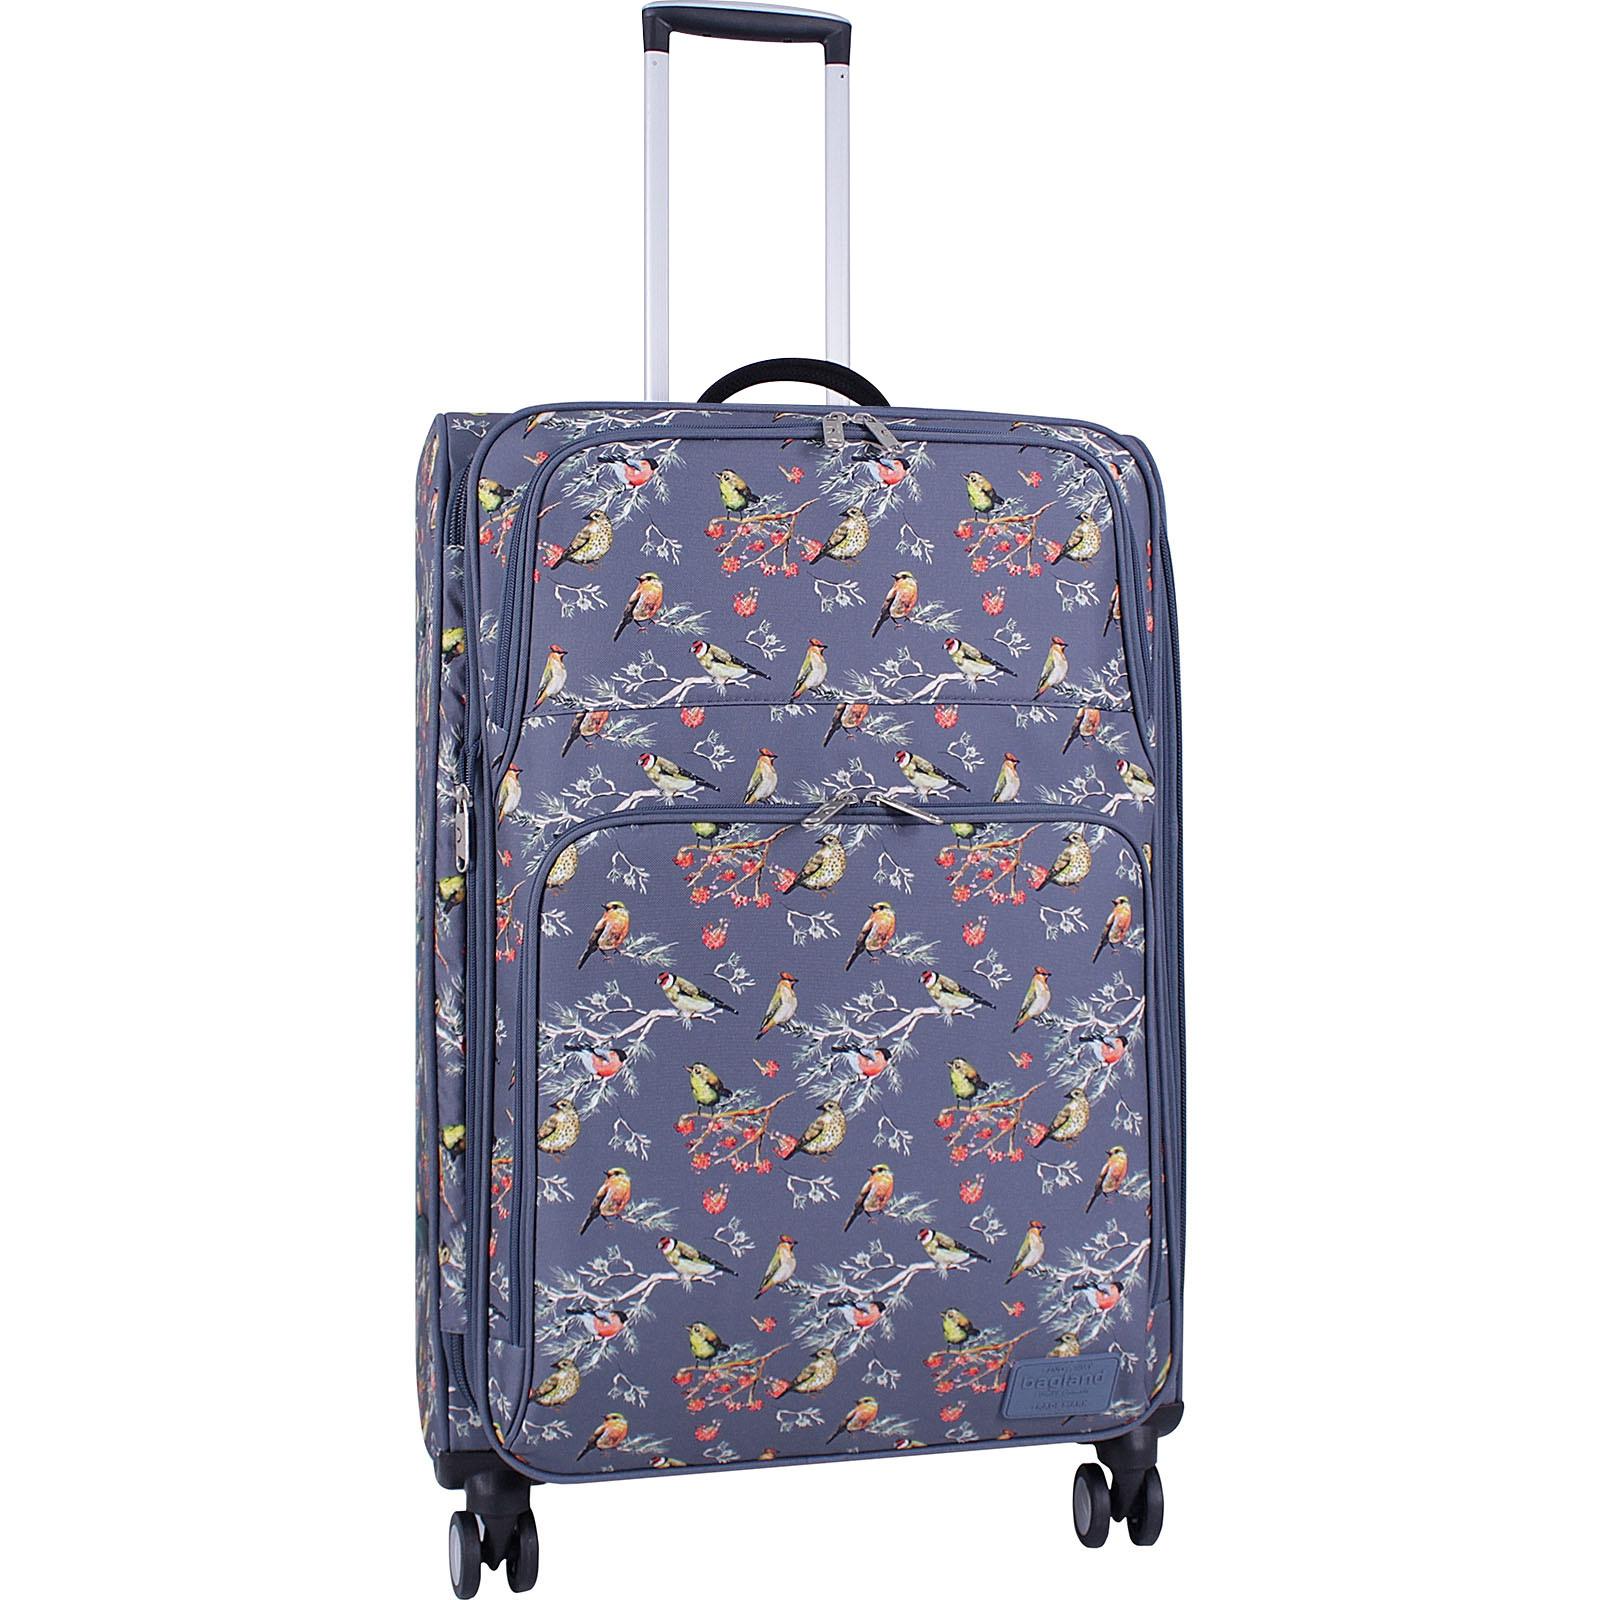 Дорожные чемоданы Чемодан Bagland Валенсия большой дизайн 83 л. сублімація 445 (0037966274) IMG_5017_суб.445_.JPG